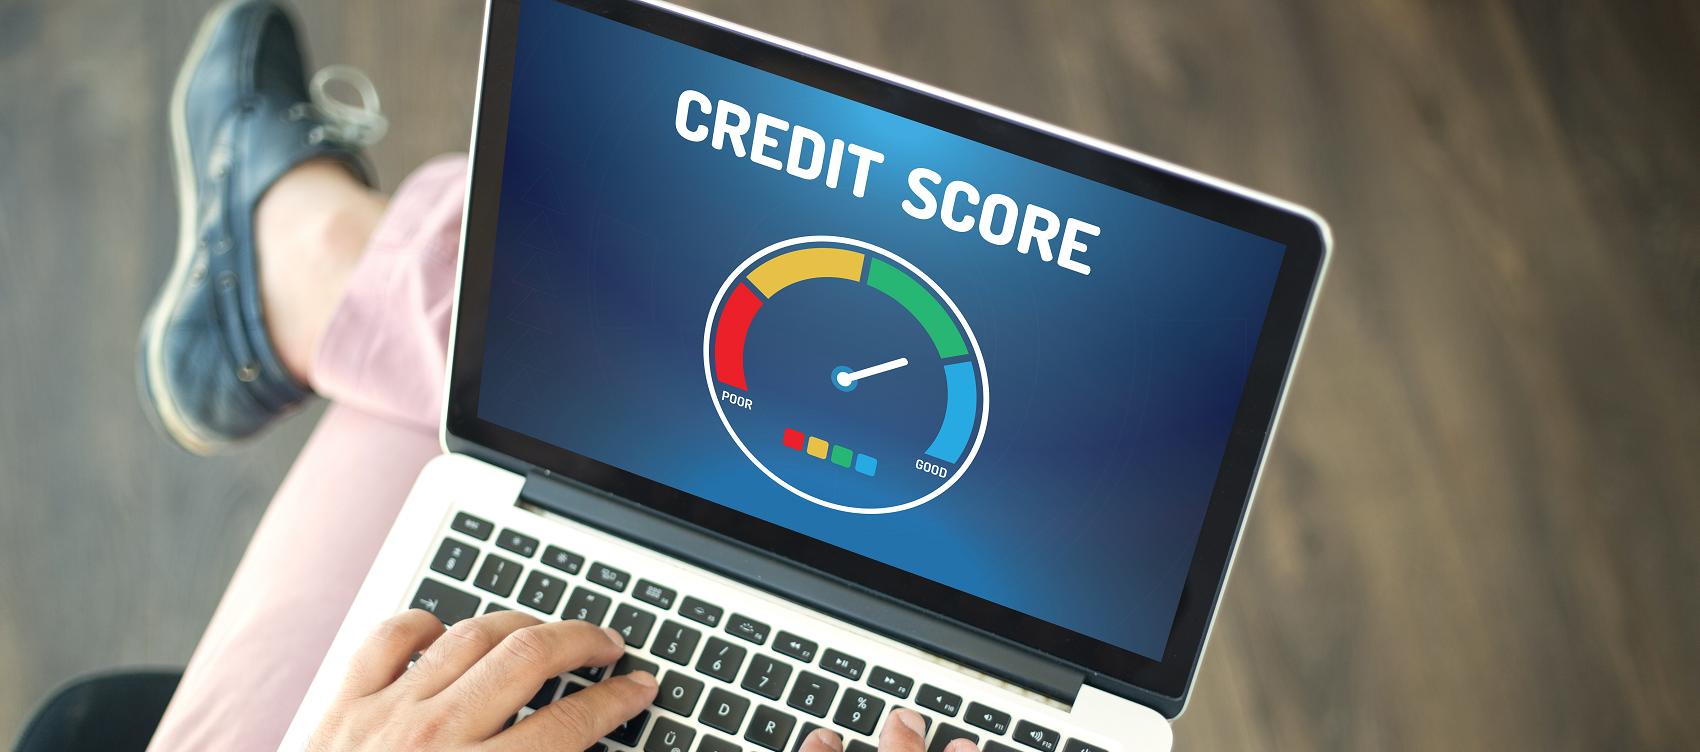 What Determines Credit Score